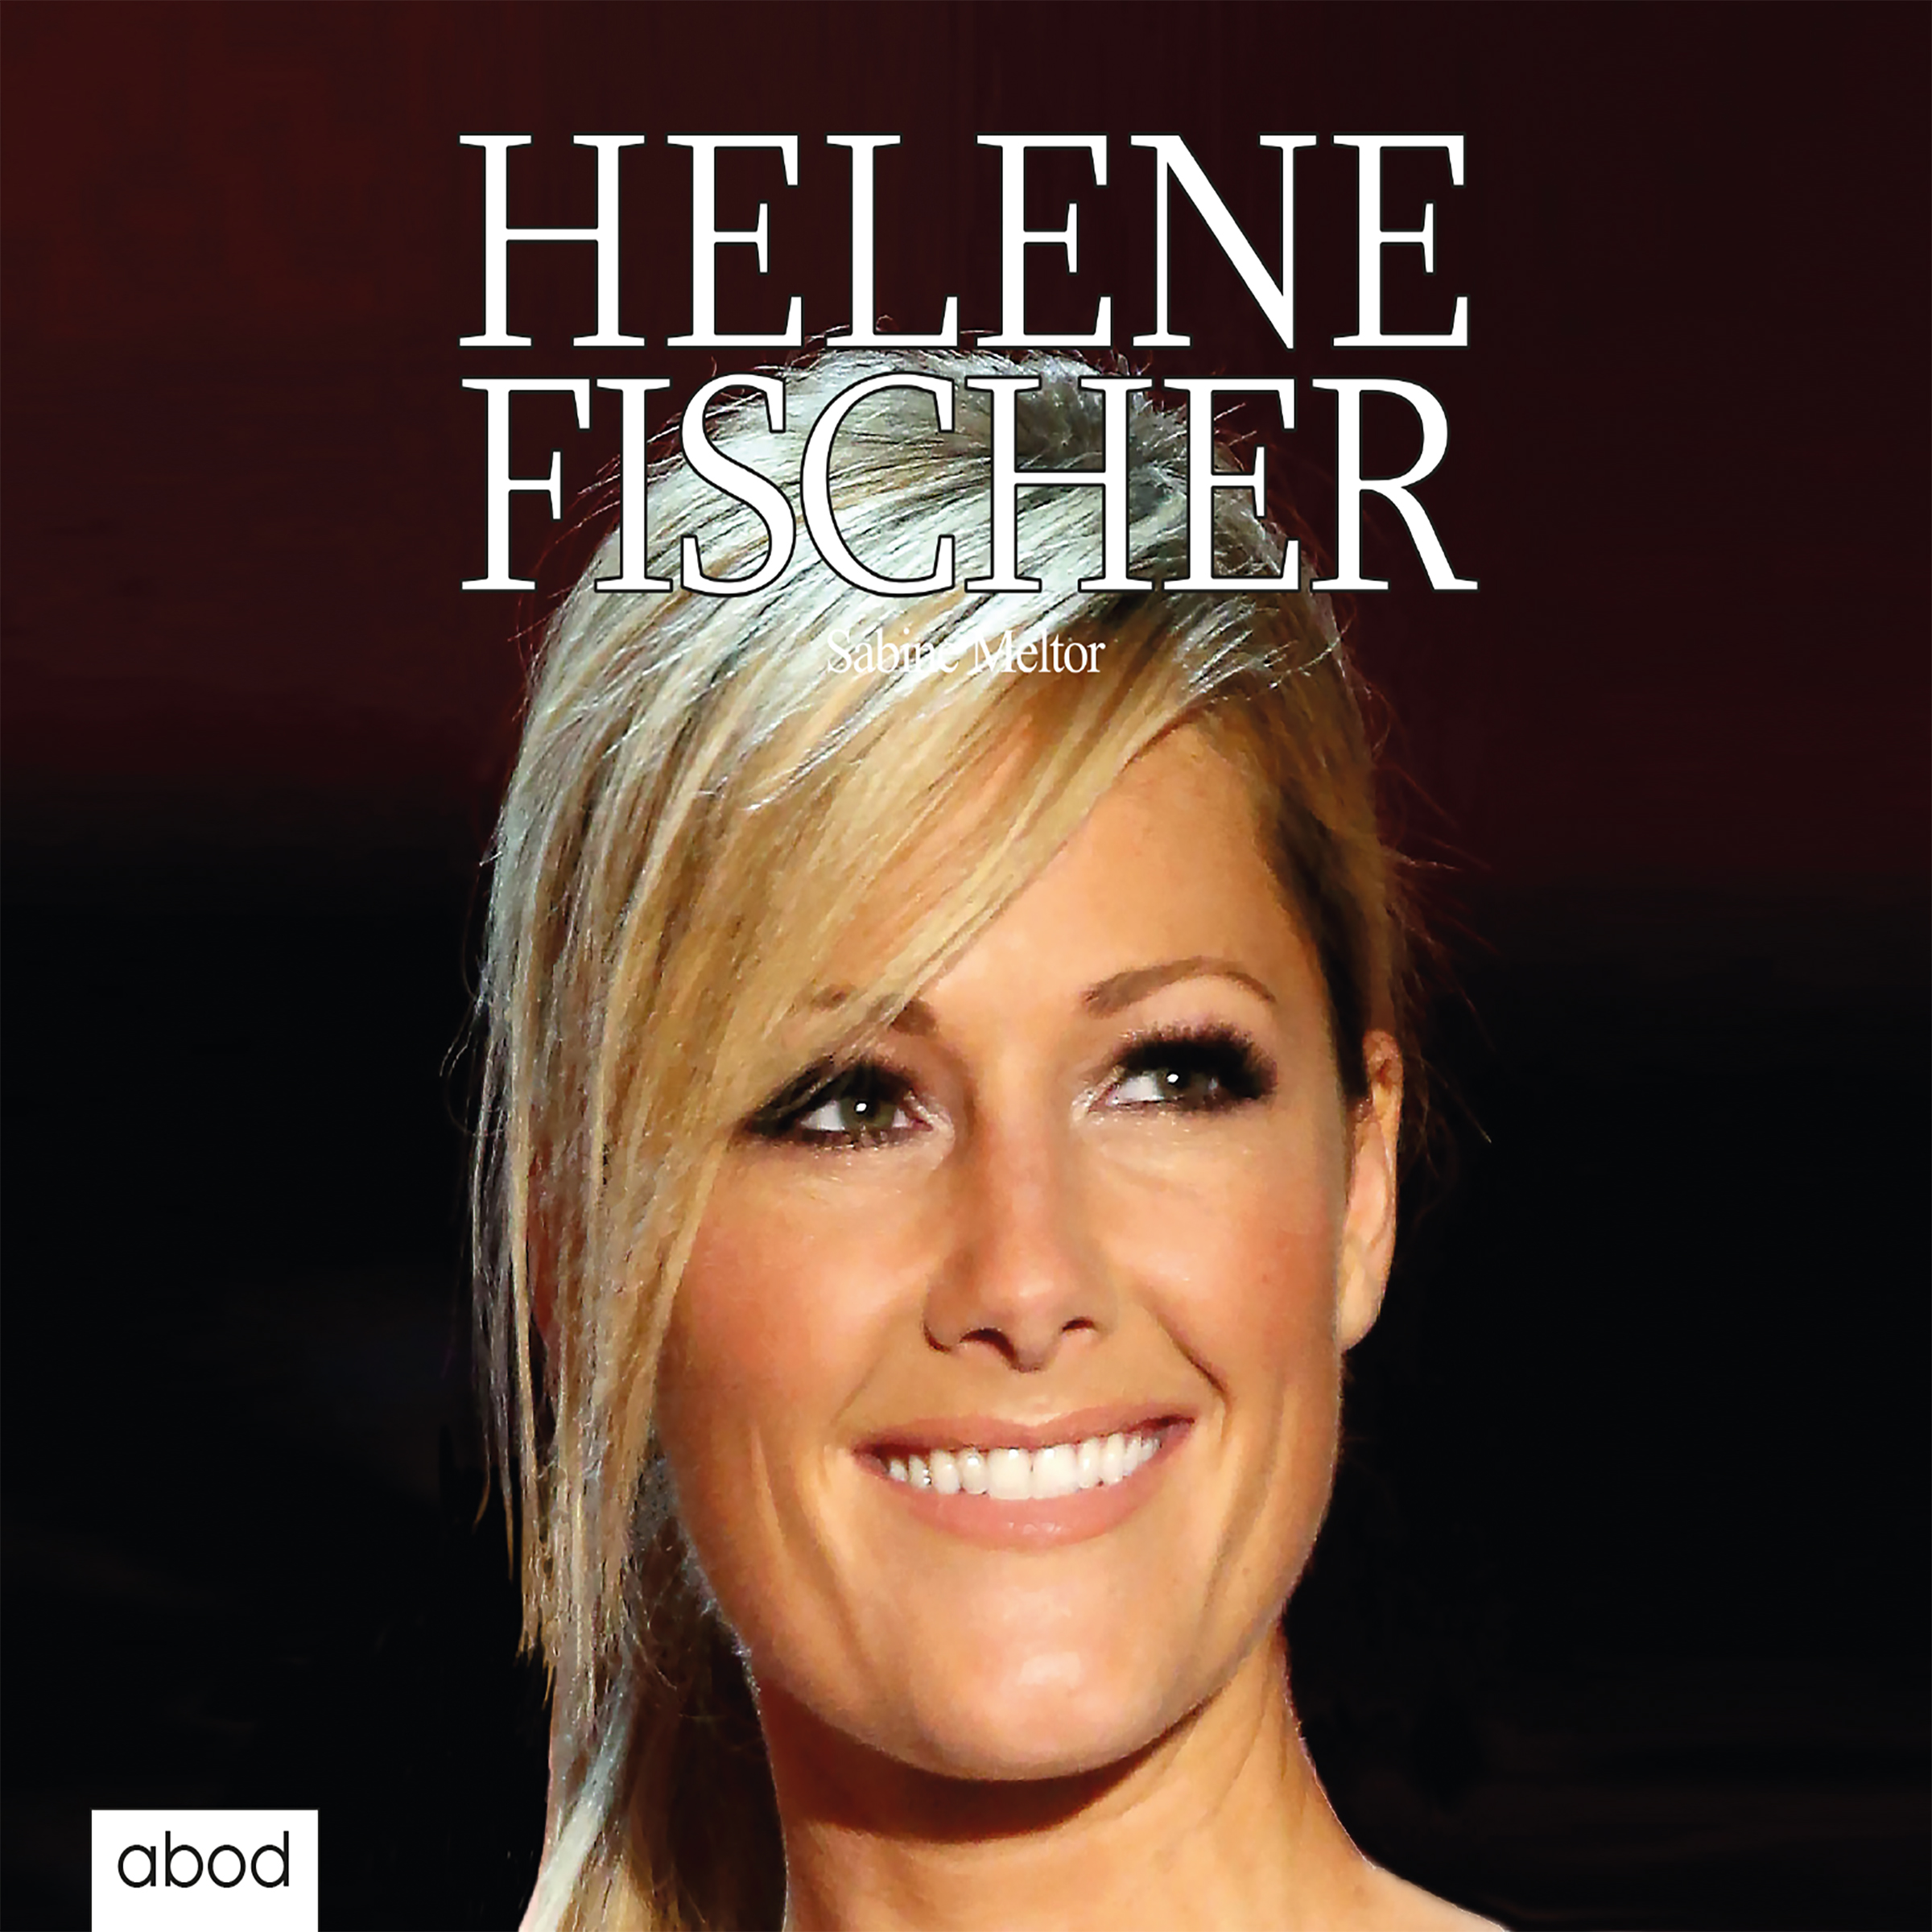 Helene Fischer - Sabine Meltor [Audio CD]